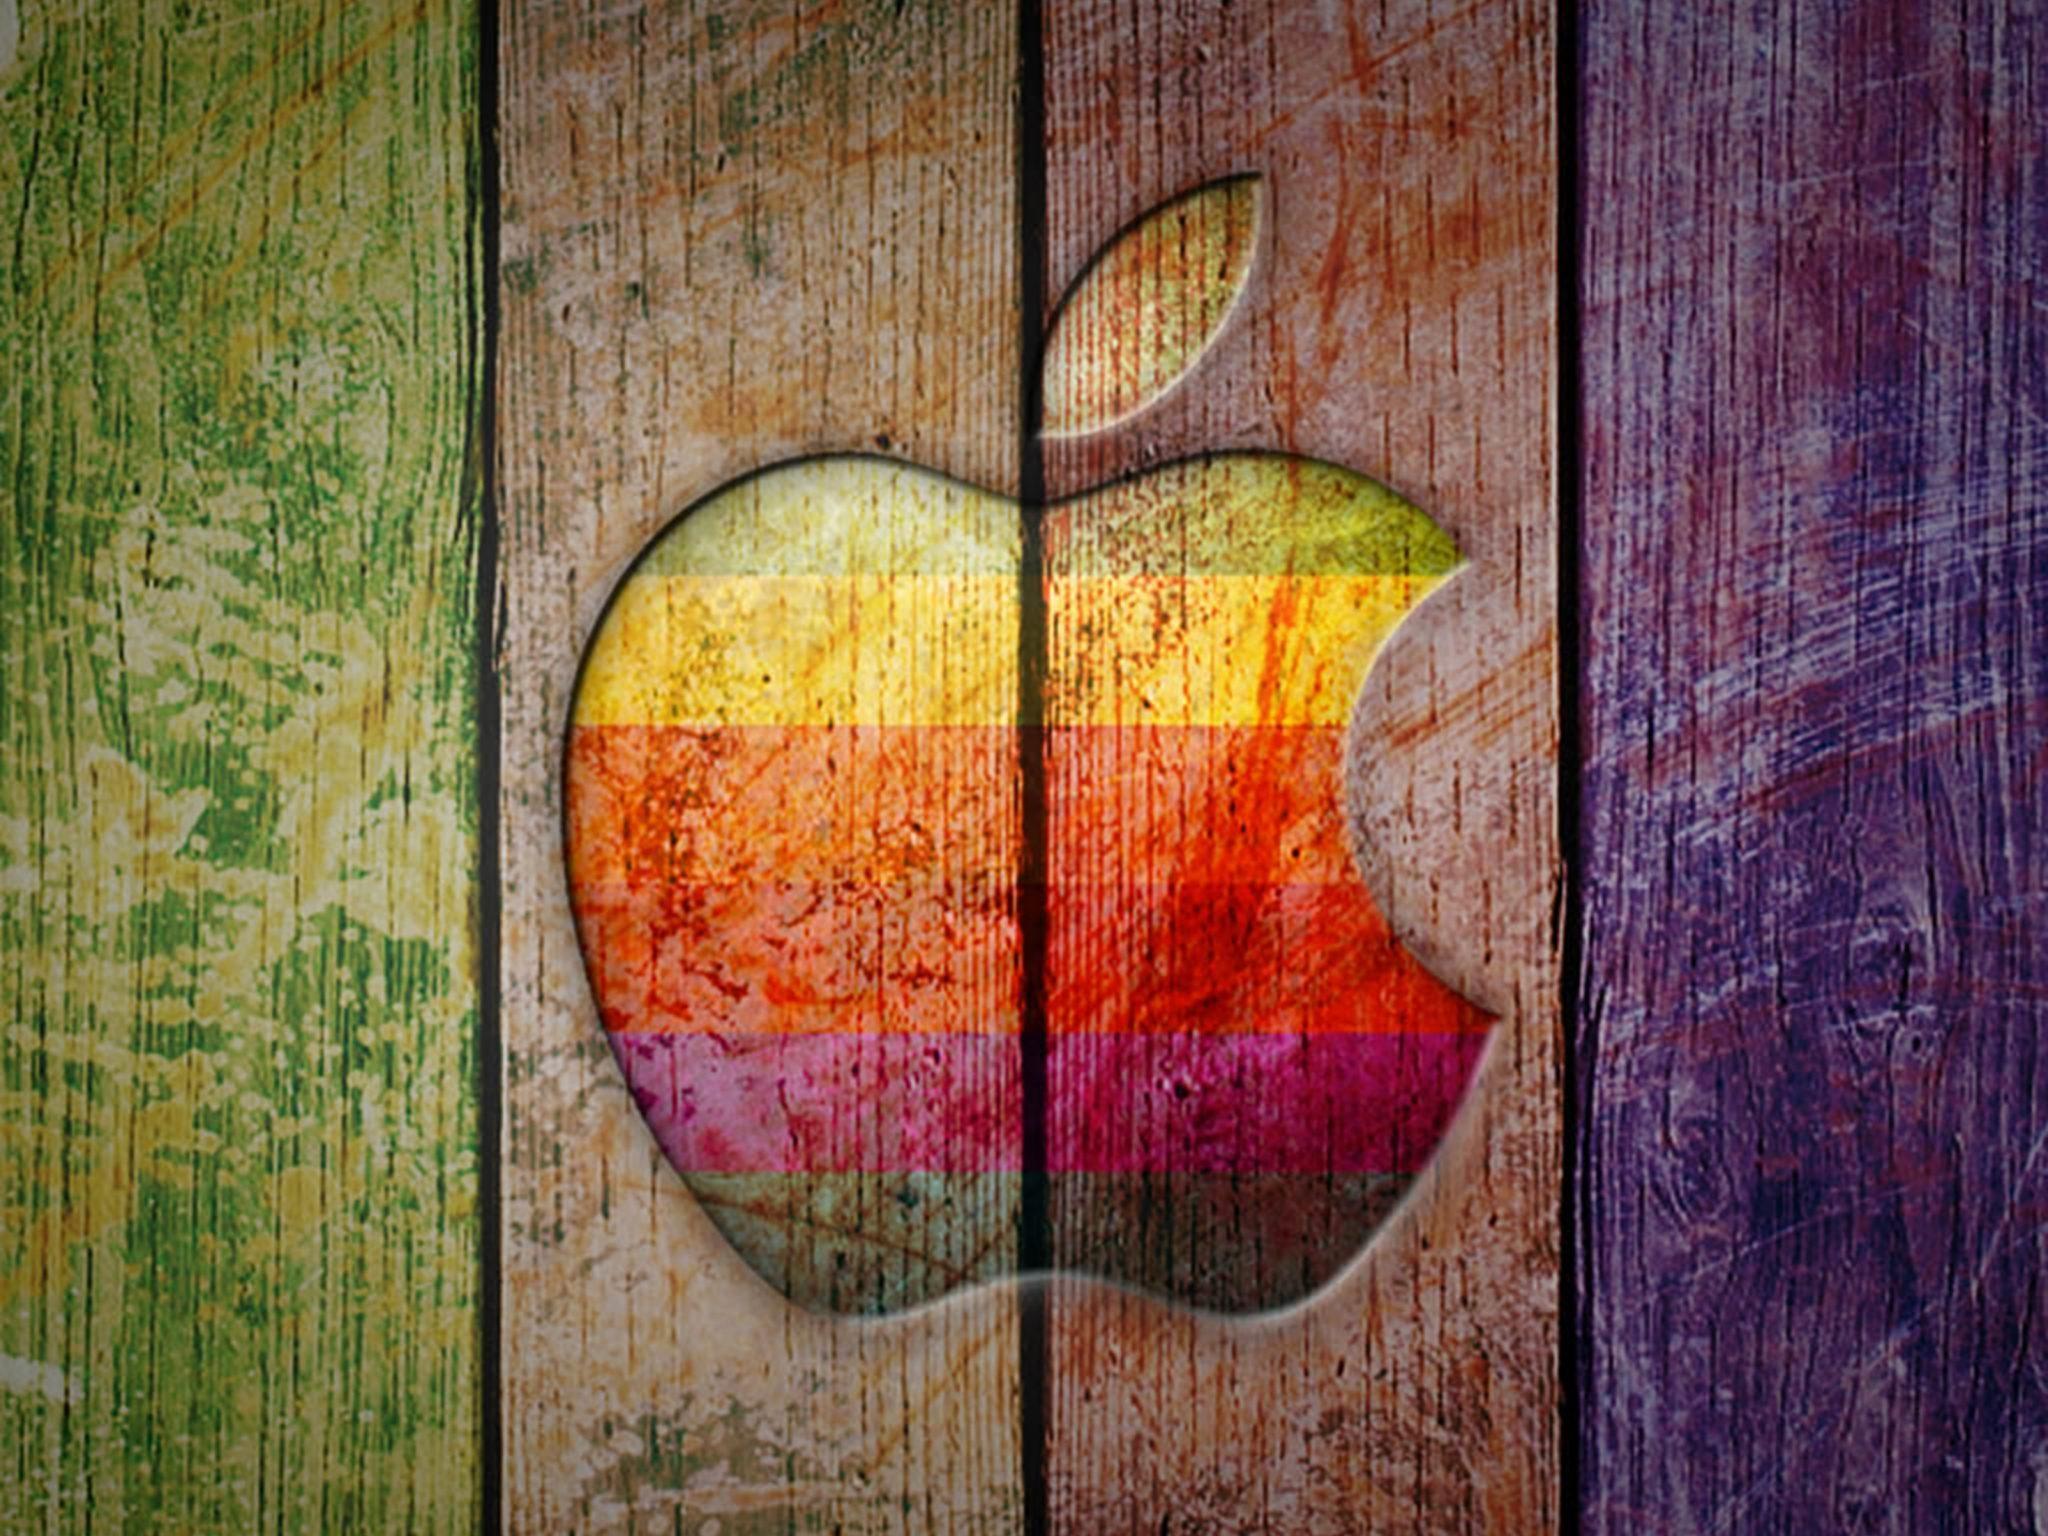 2048x1536 wallpaper Apple Logo on Colorful Wood Ipad Wallpaper 2048x1536 pixels resolution